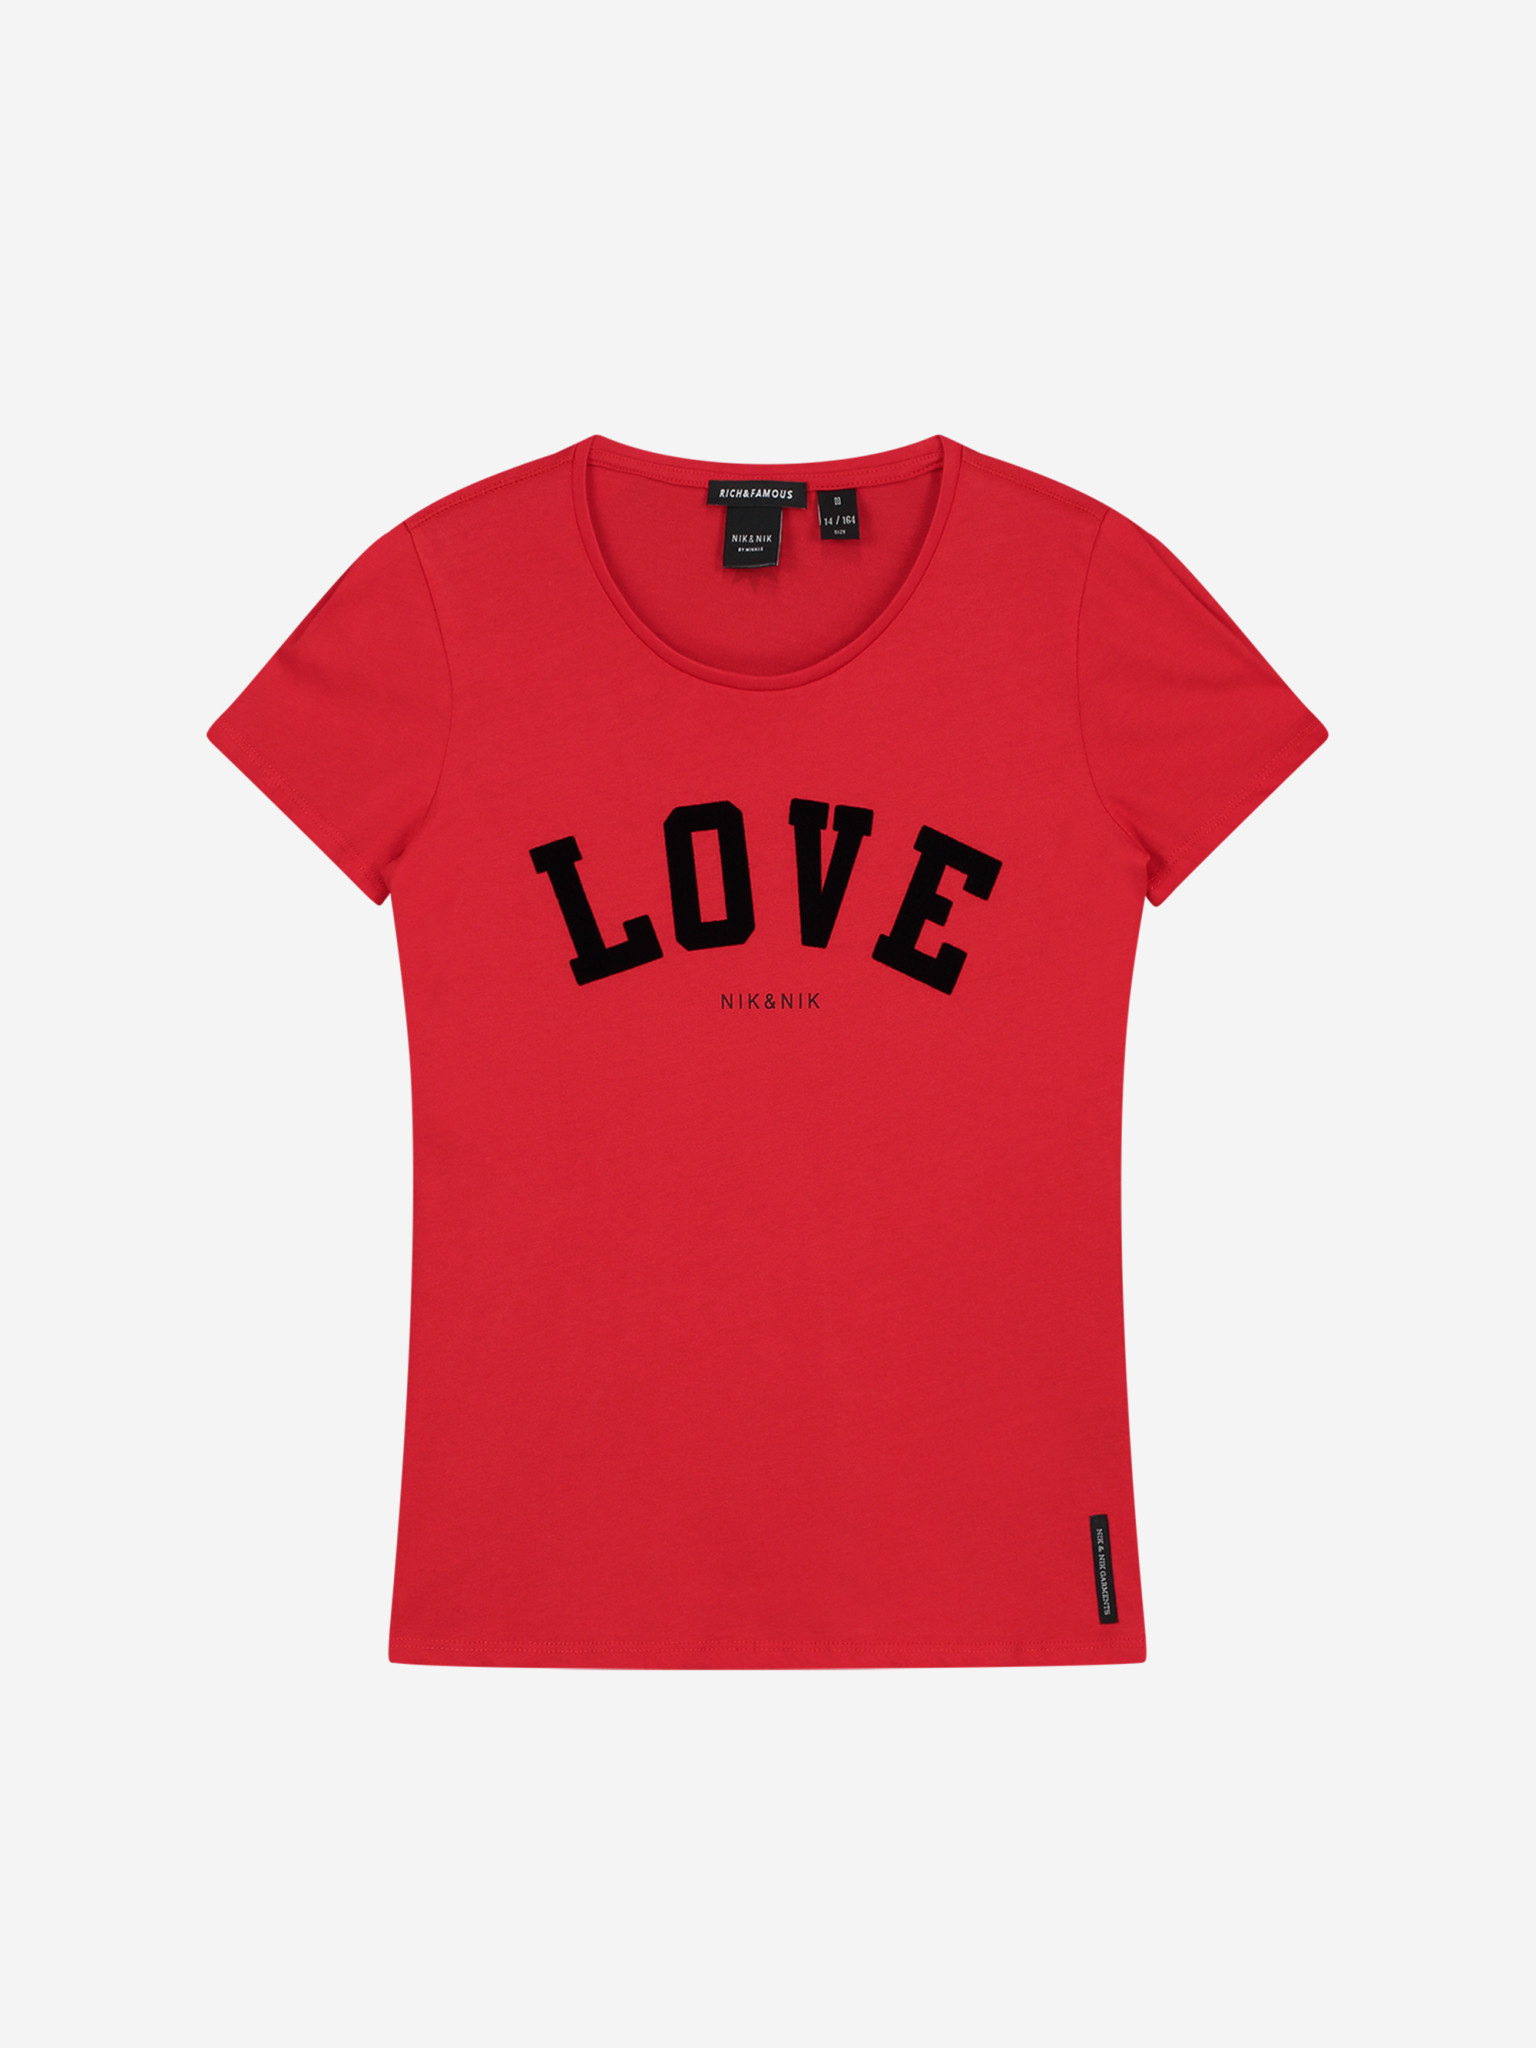 Nik & Nik Love T-Shirt